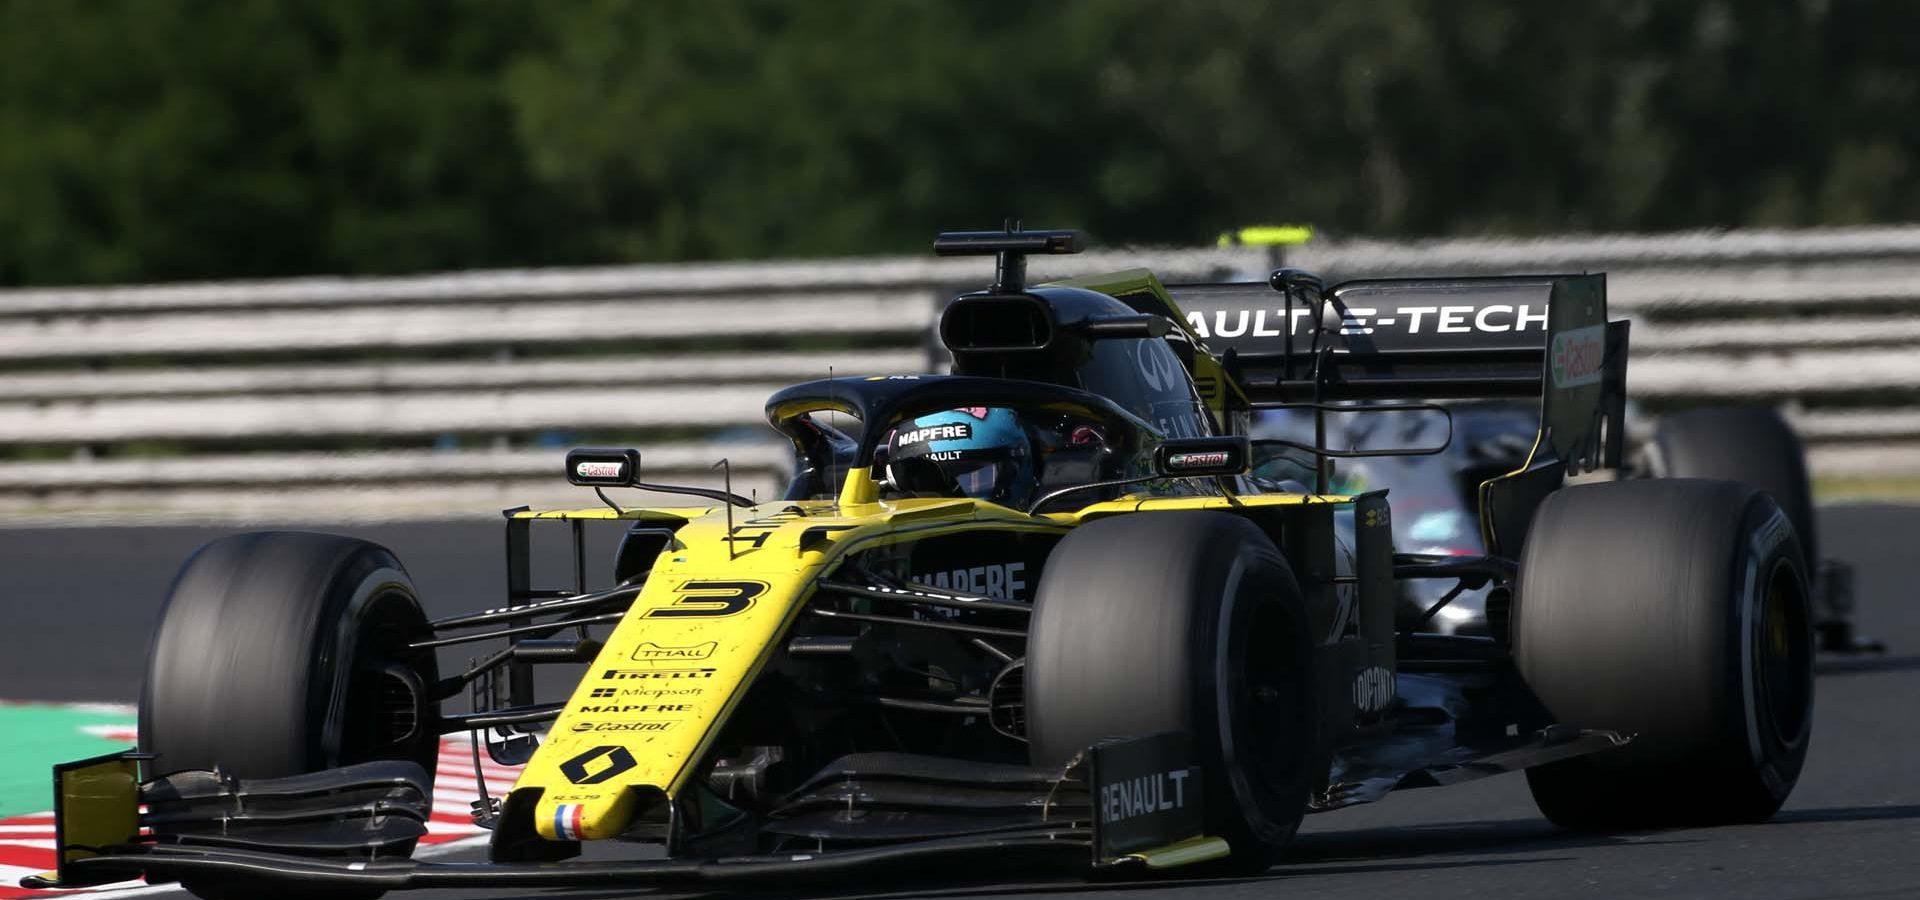 Daniel Ricciardo (AUS) Renault F1 Team RS19. Hungarian Grand Prix, Sunday 4th August 2019. Budapest, Hungary.